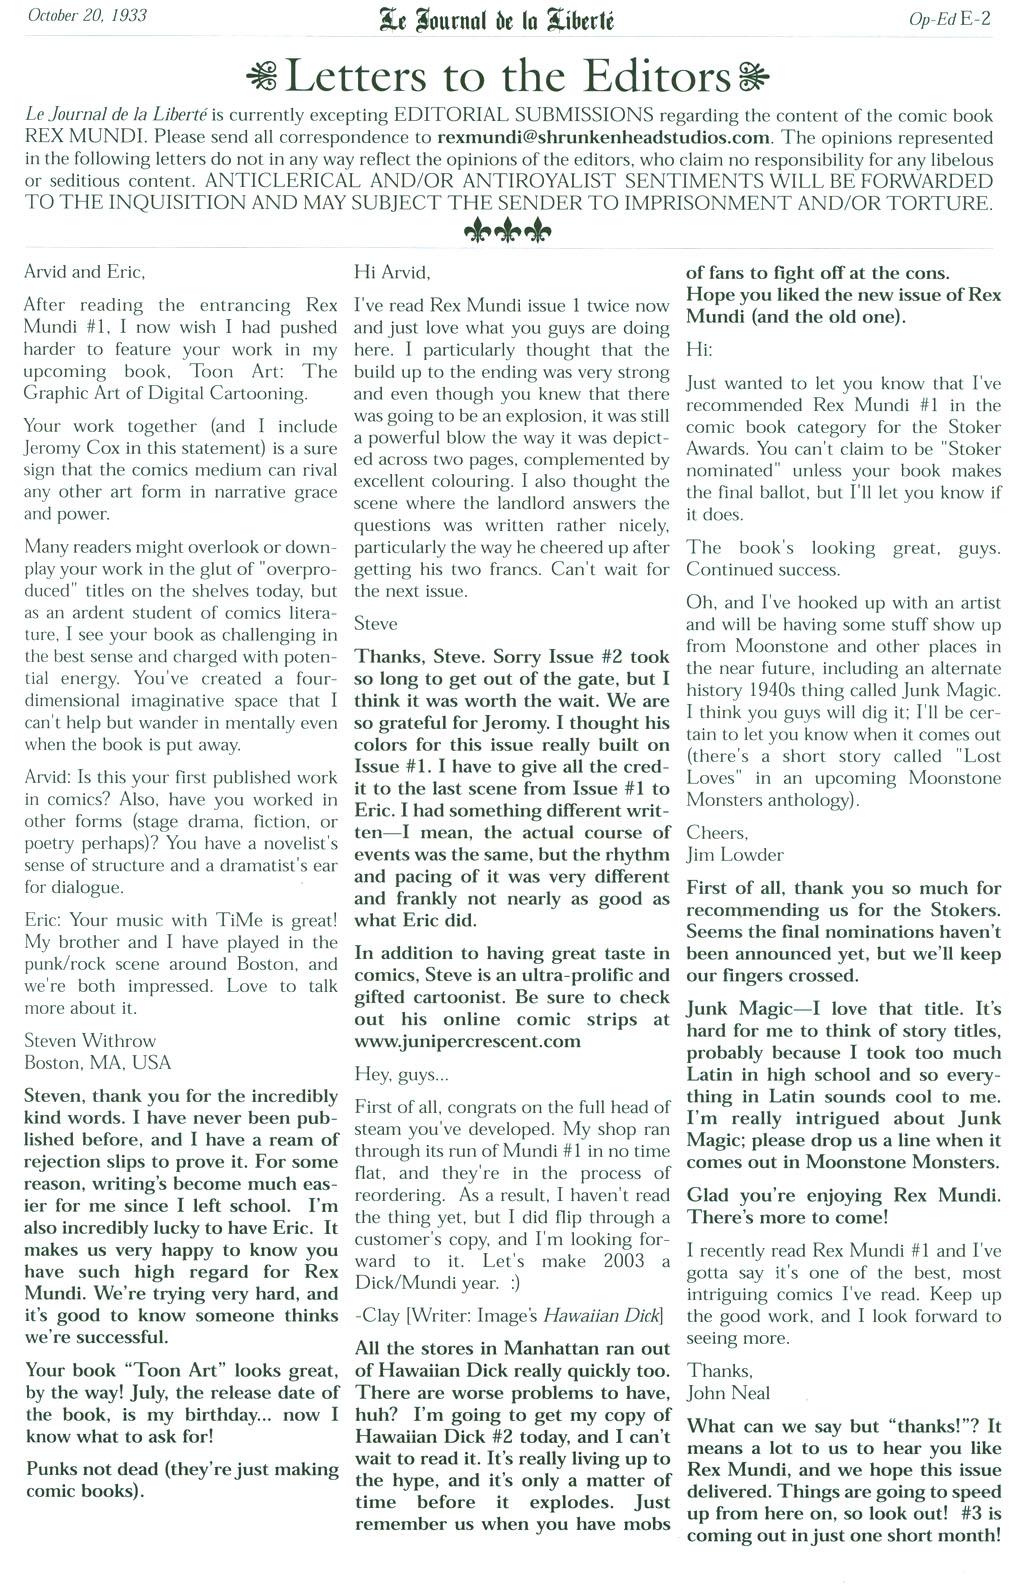 Read online Rex Mundi comic -  Issue #2 - 28